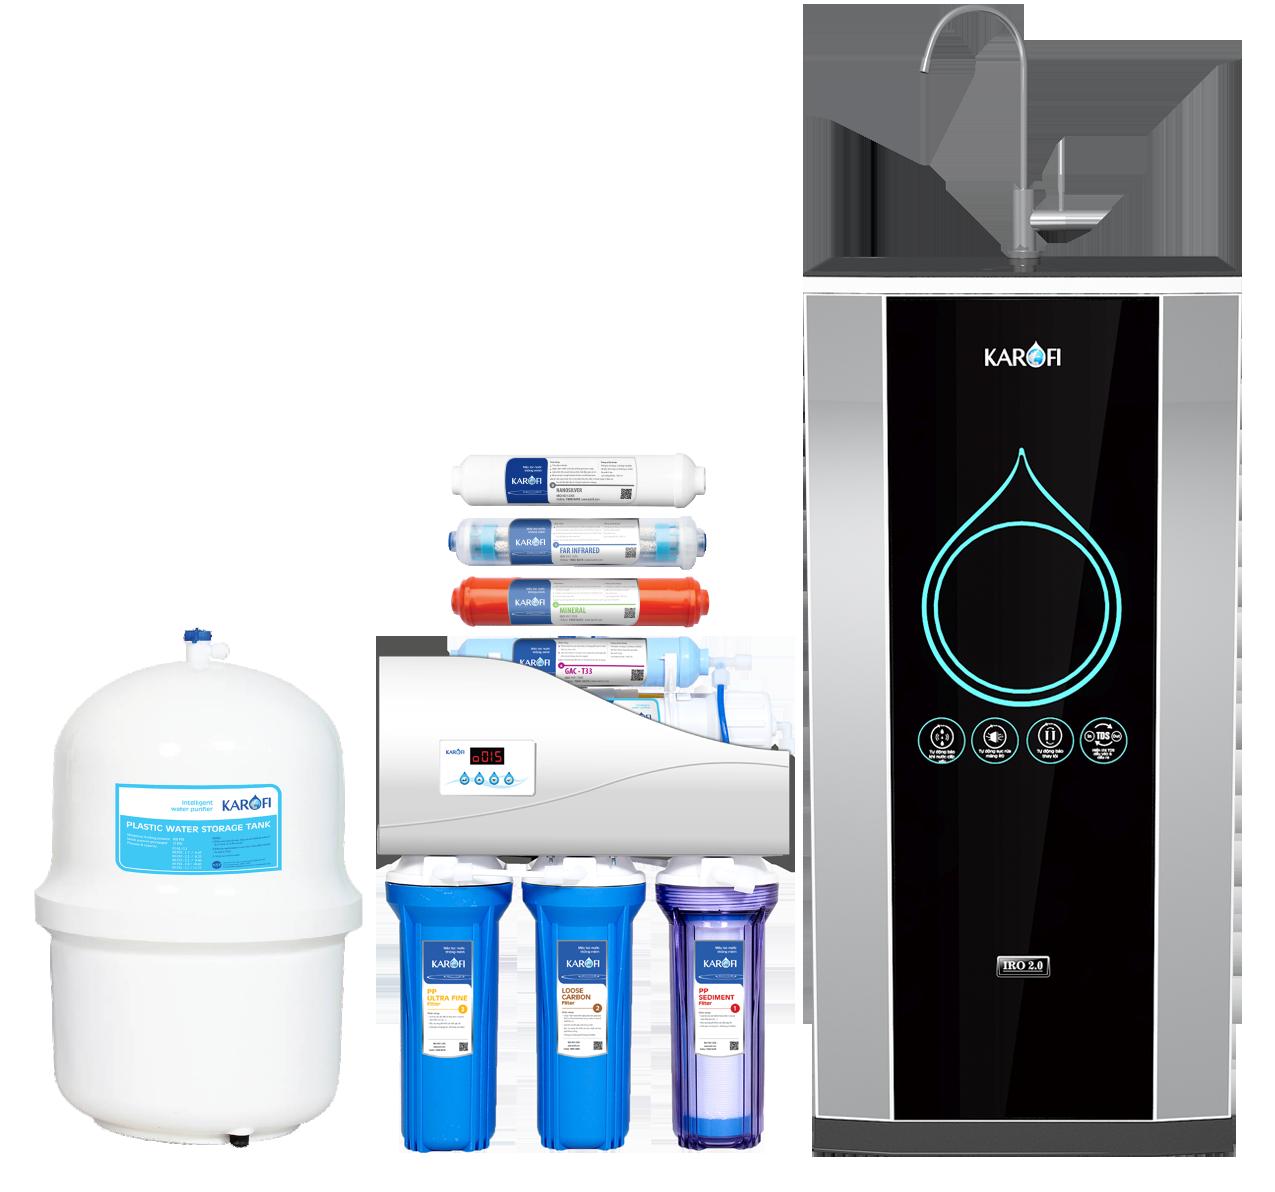 Nên mua máy lọc nước karofi RO hay Nano